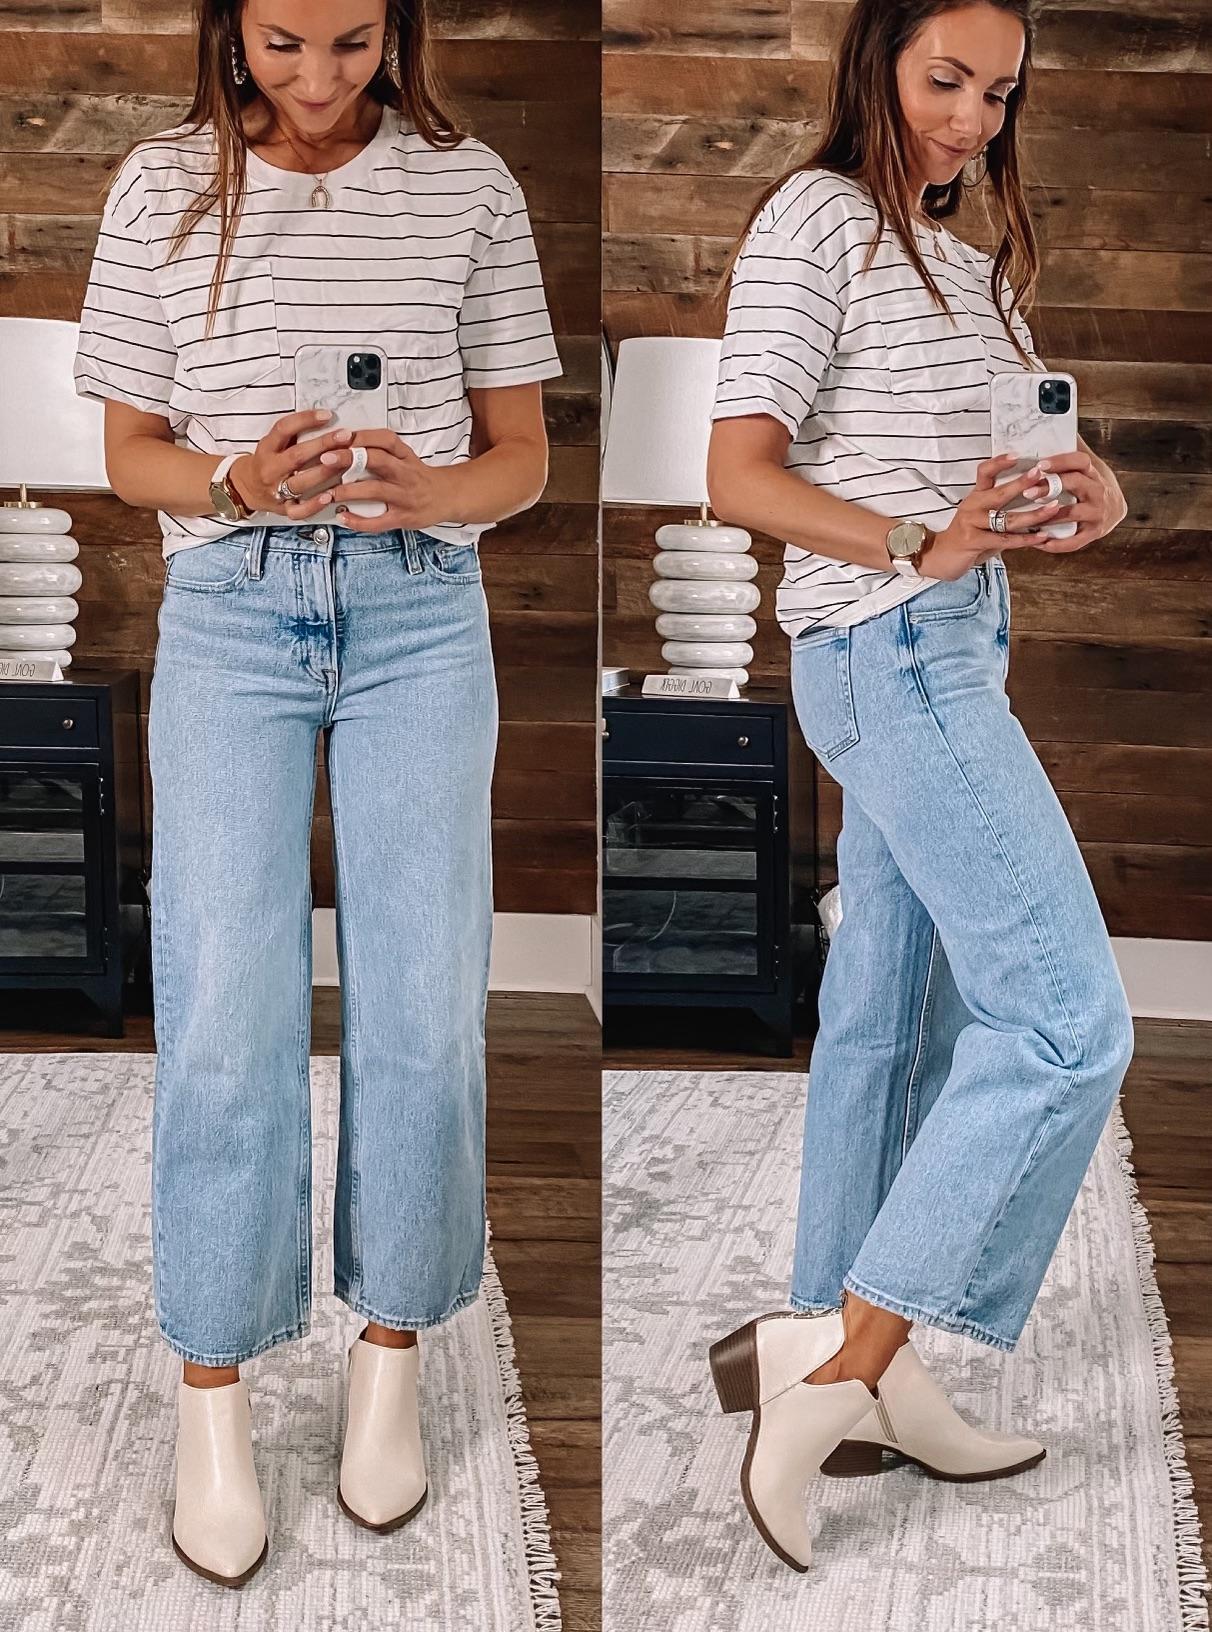 walmart jeans, walmart tee